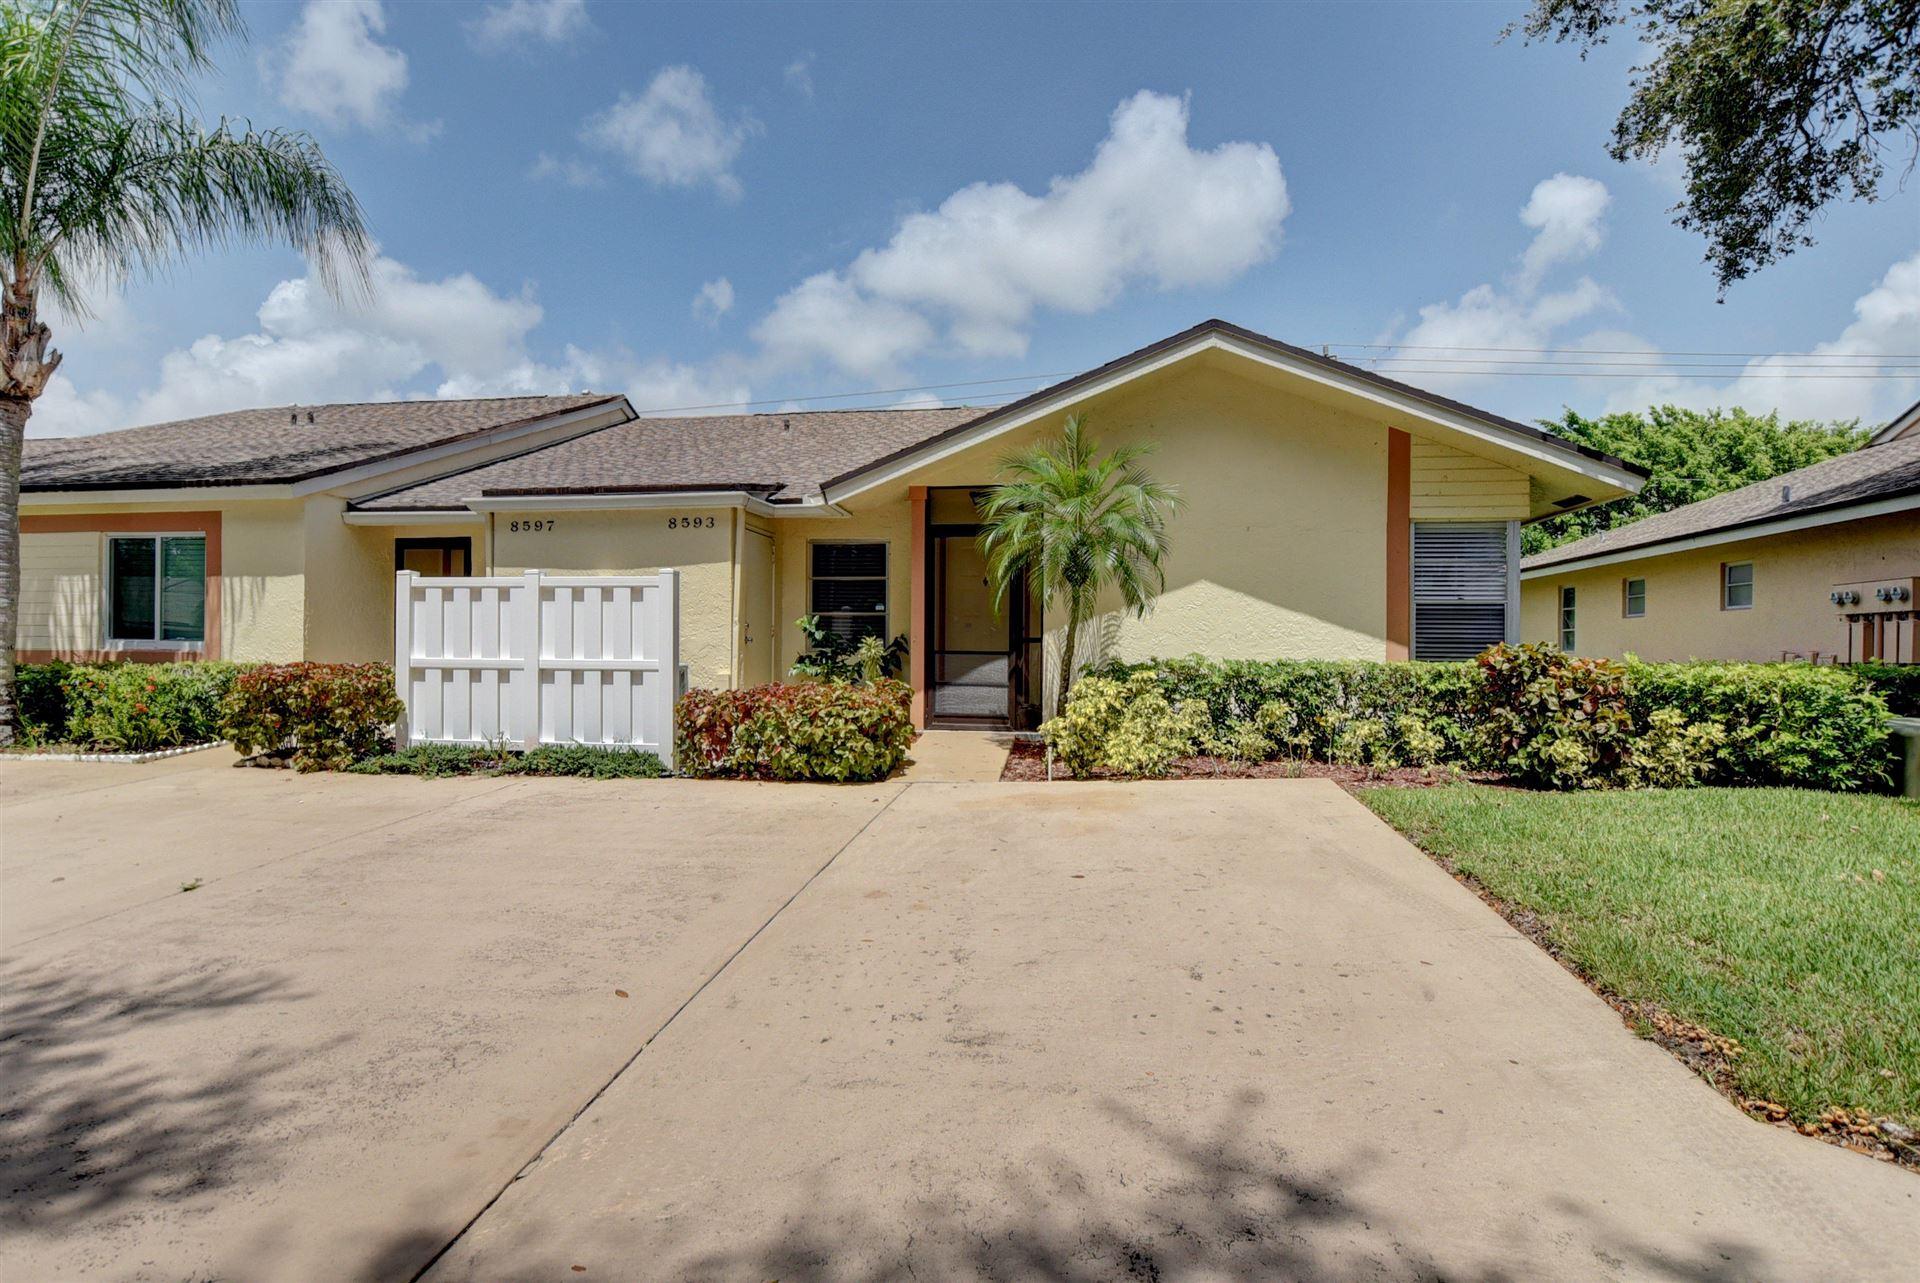 8593 Sunbird Place, Boca Raton, FL 33496 - #: RX-10653575